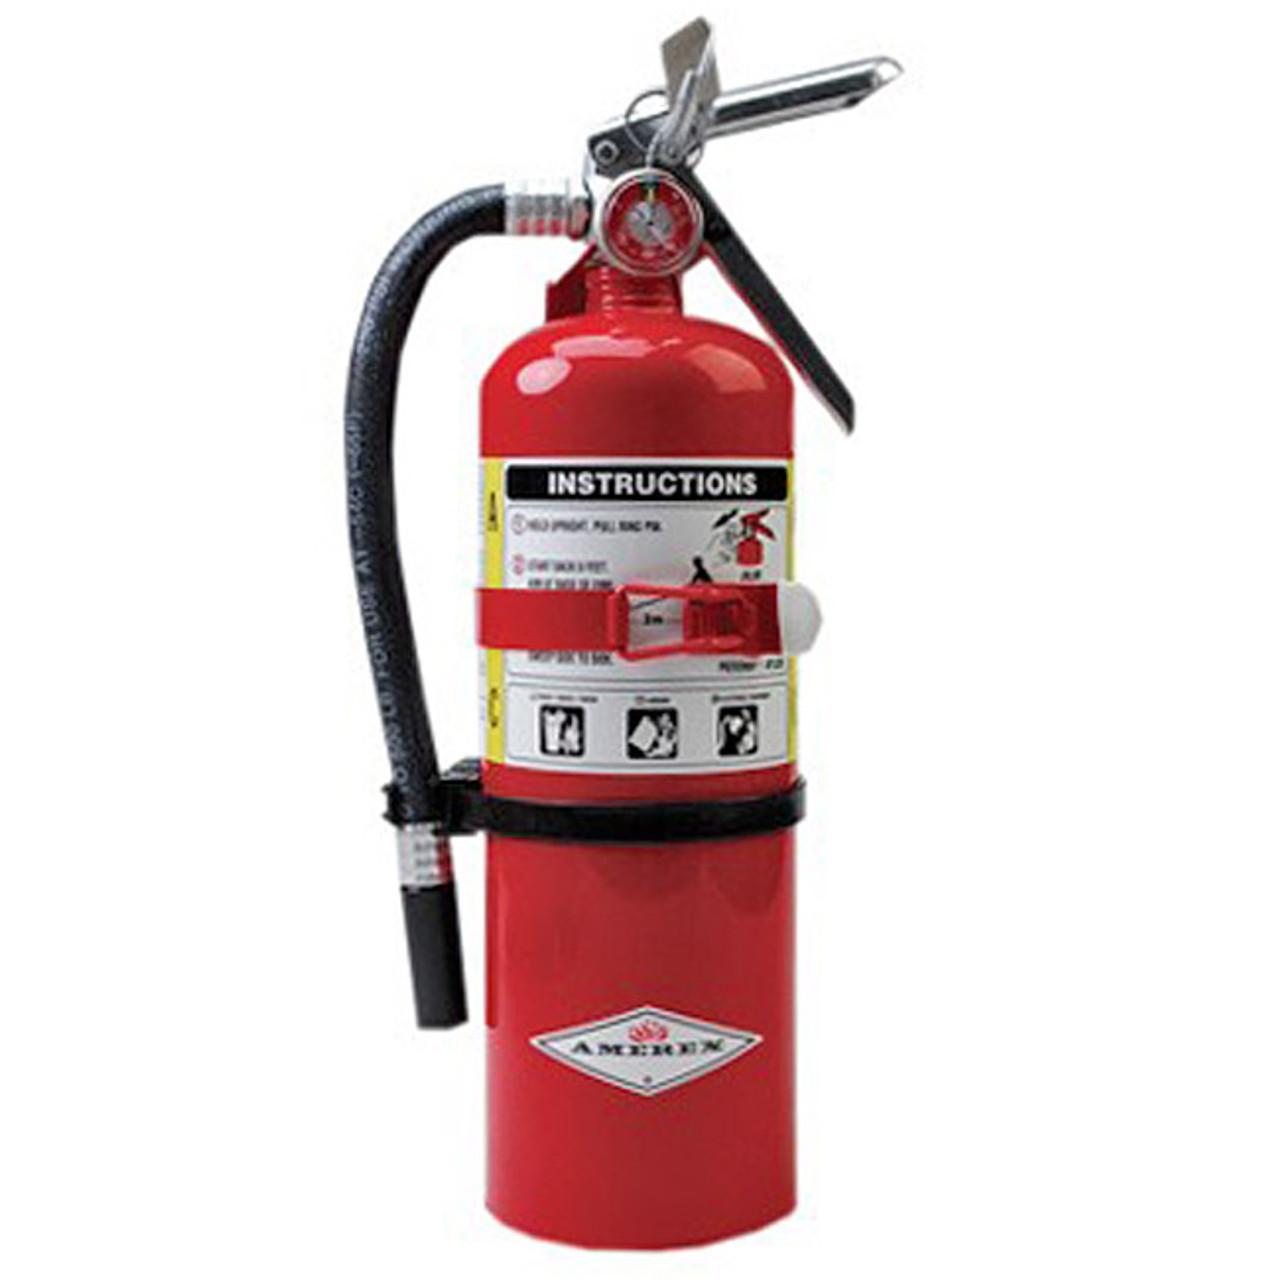 Amerex B500T ABC 5 lb. Fire Extinguisher with Vehicle Bracket